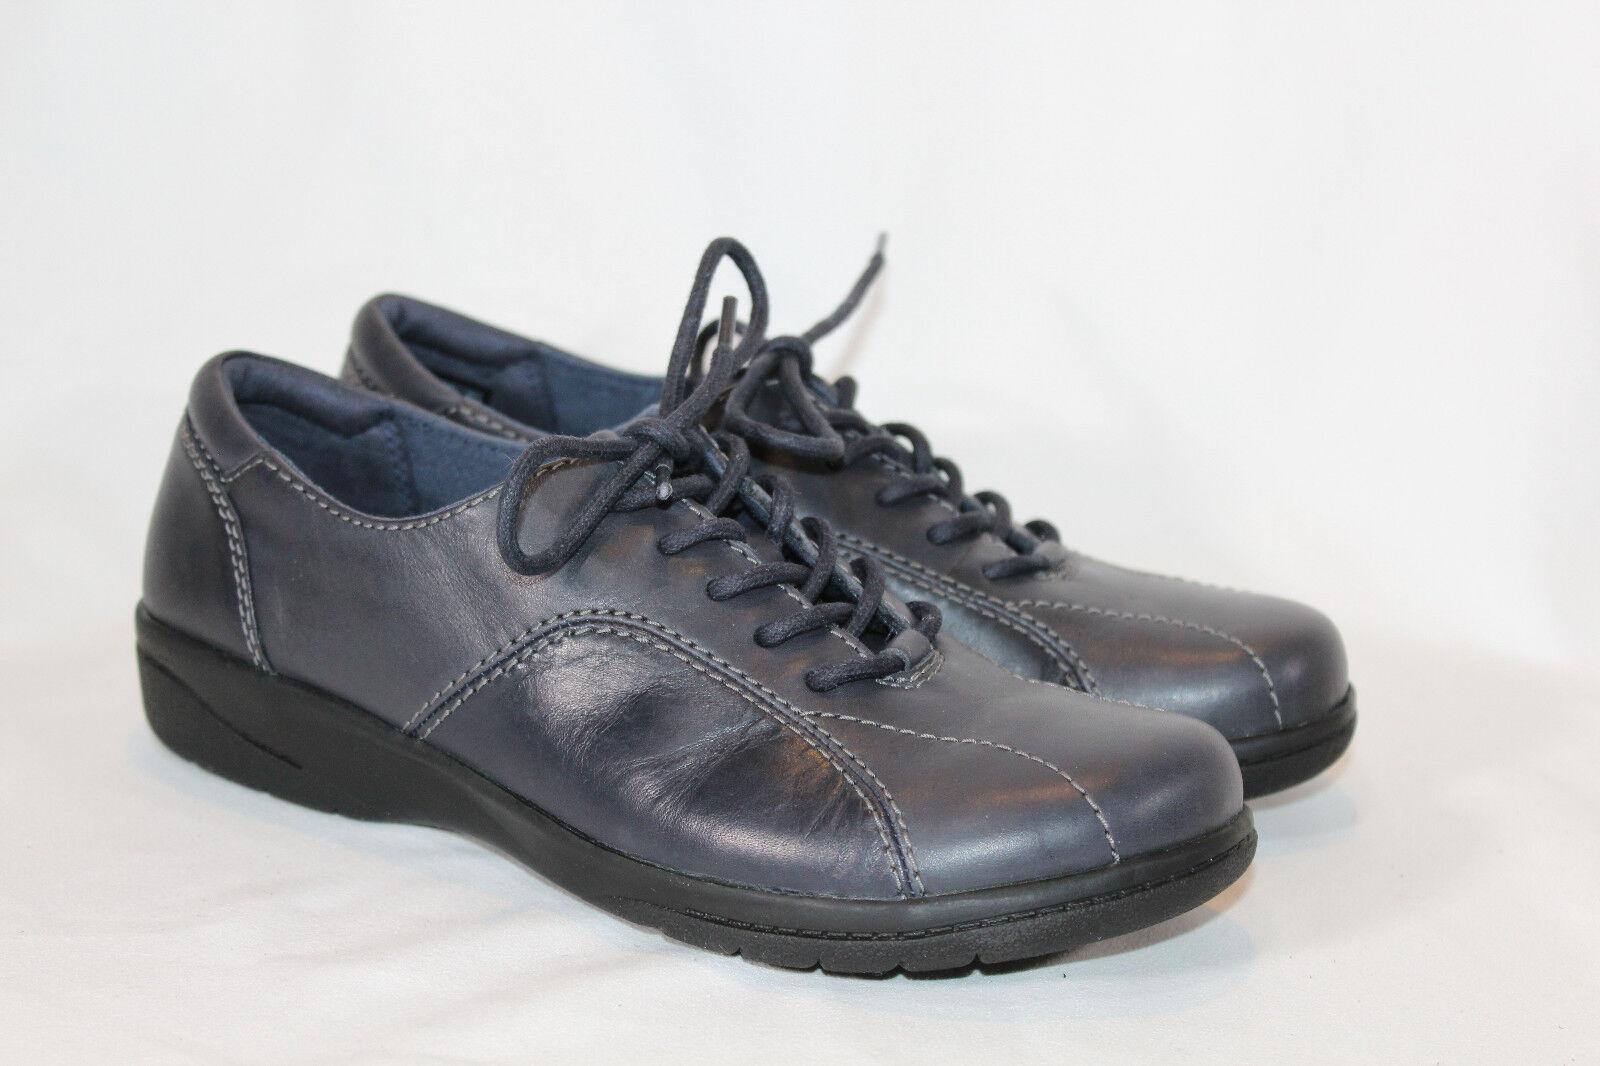 Clarks Leather Lace-up shoes - Cheyn Ava 6.5 MEDIUM NAVY